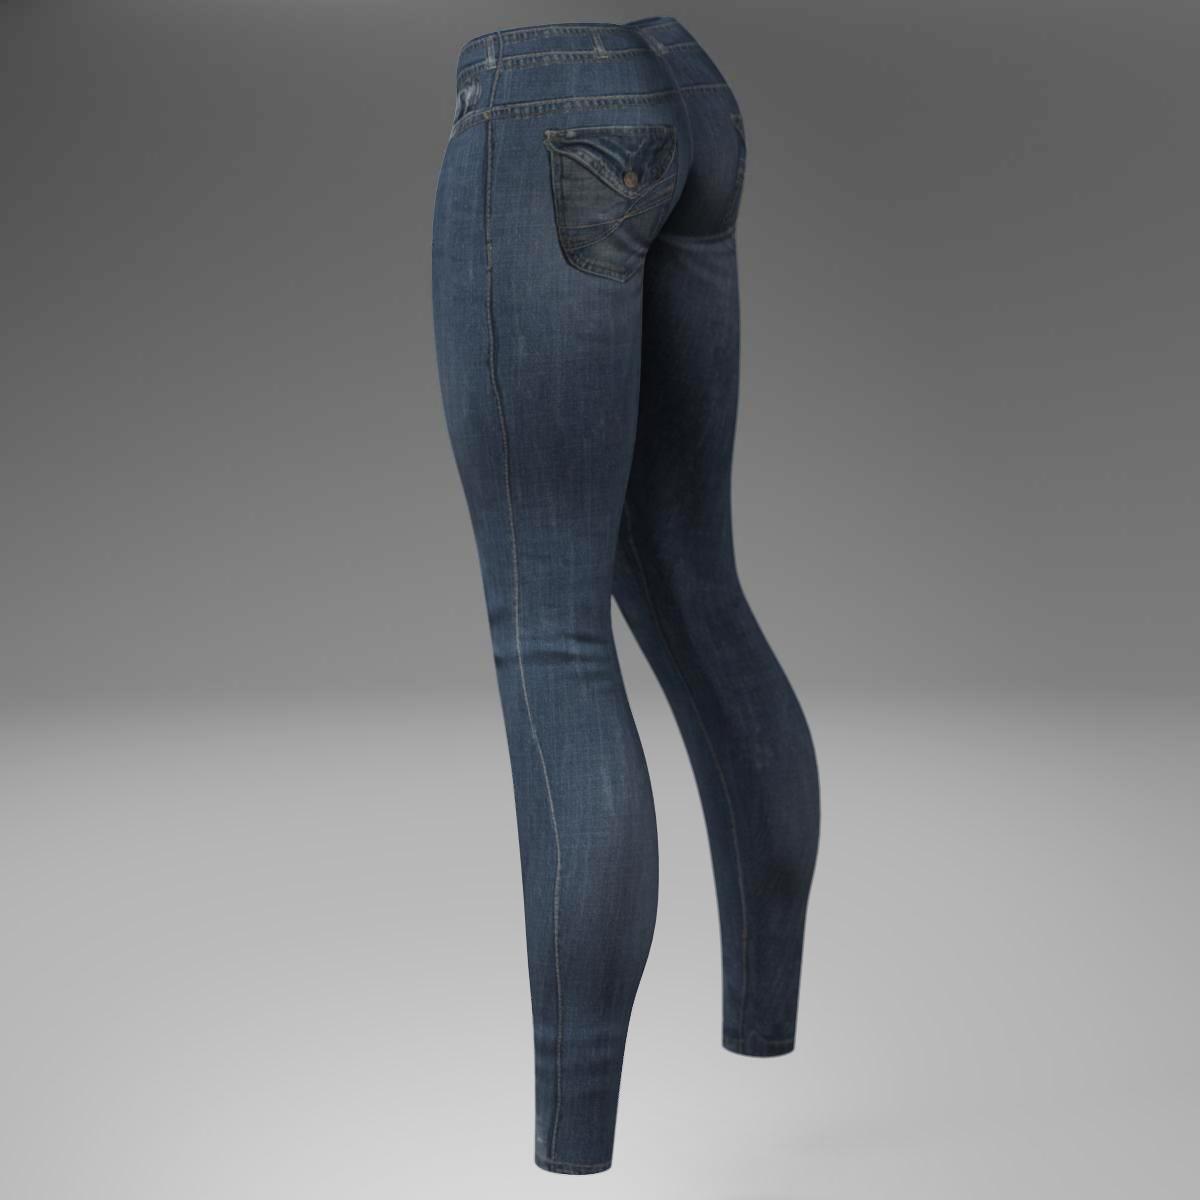 female jeans 3d model 3ds max fbx c4d ma mb obj 160405